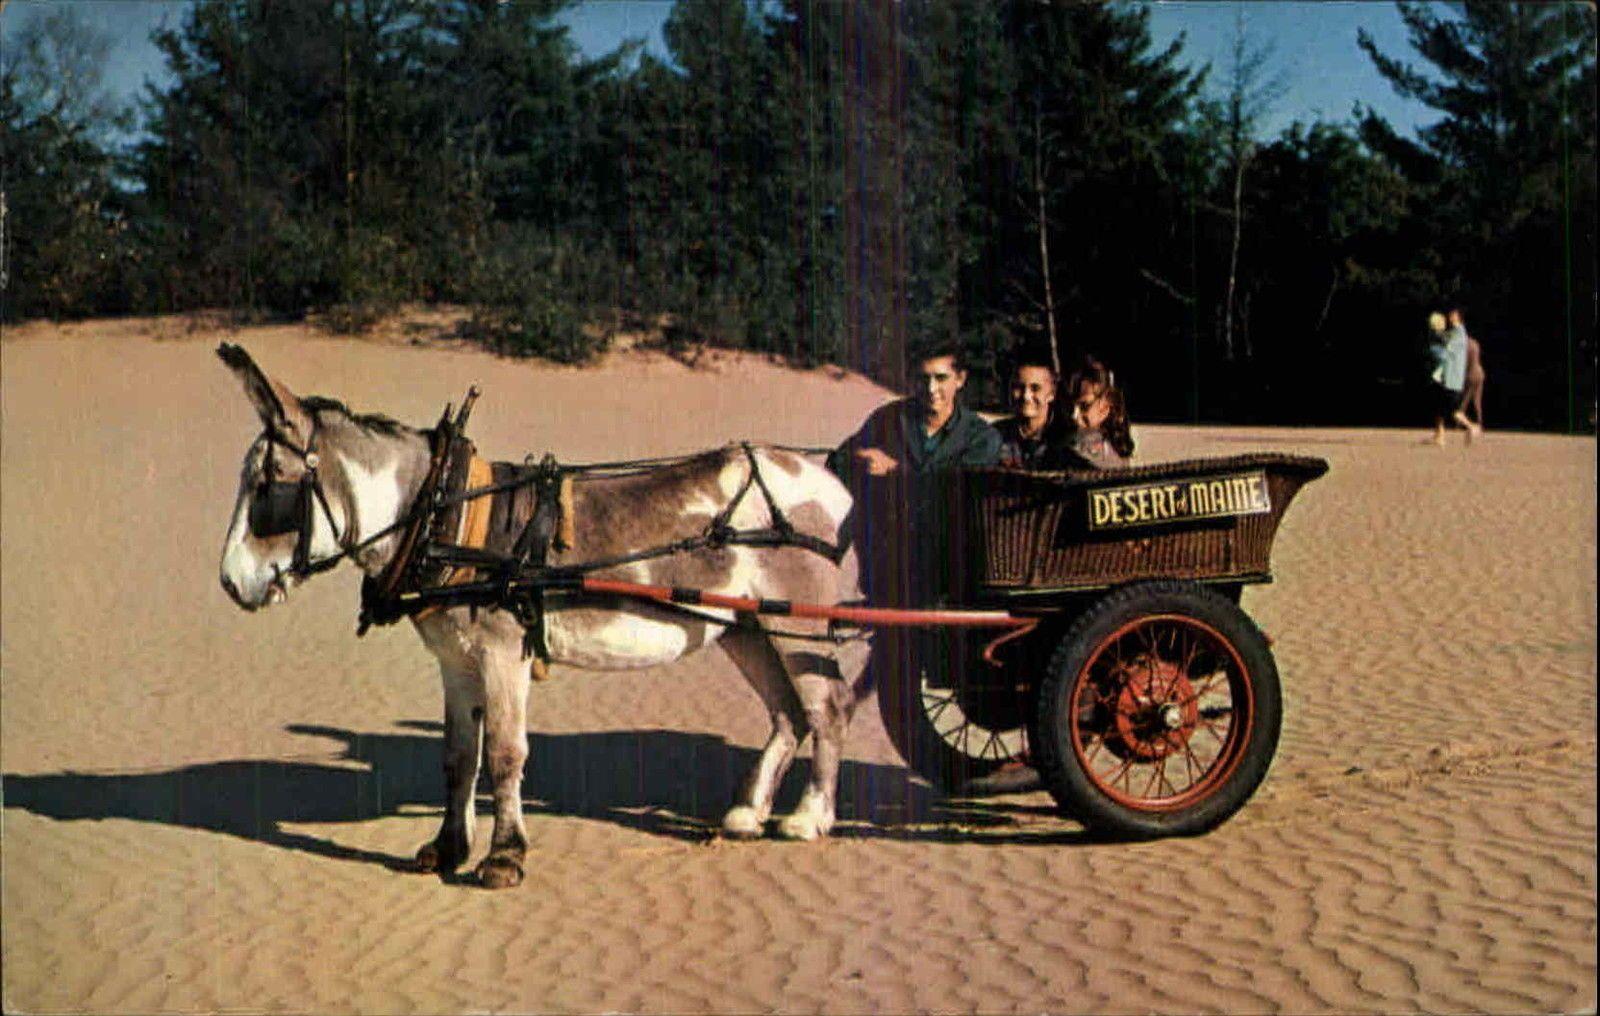 Freeport Me Desert of Maine Pedro The Burro Pulling Cart Old ...